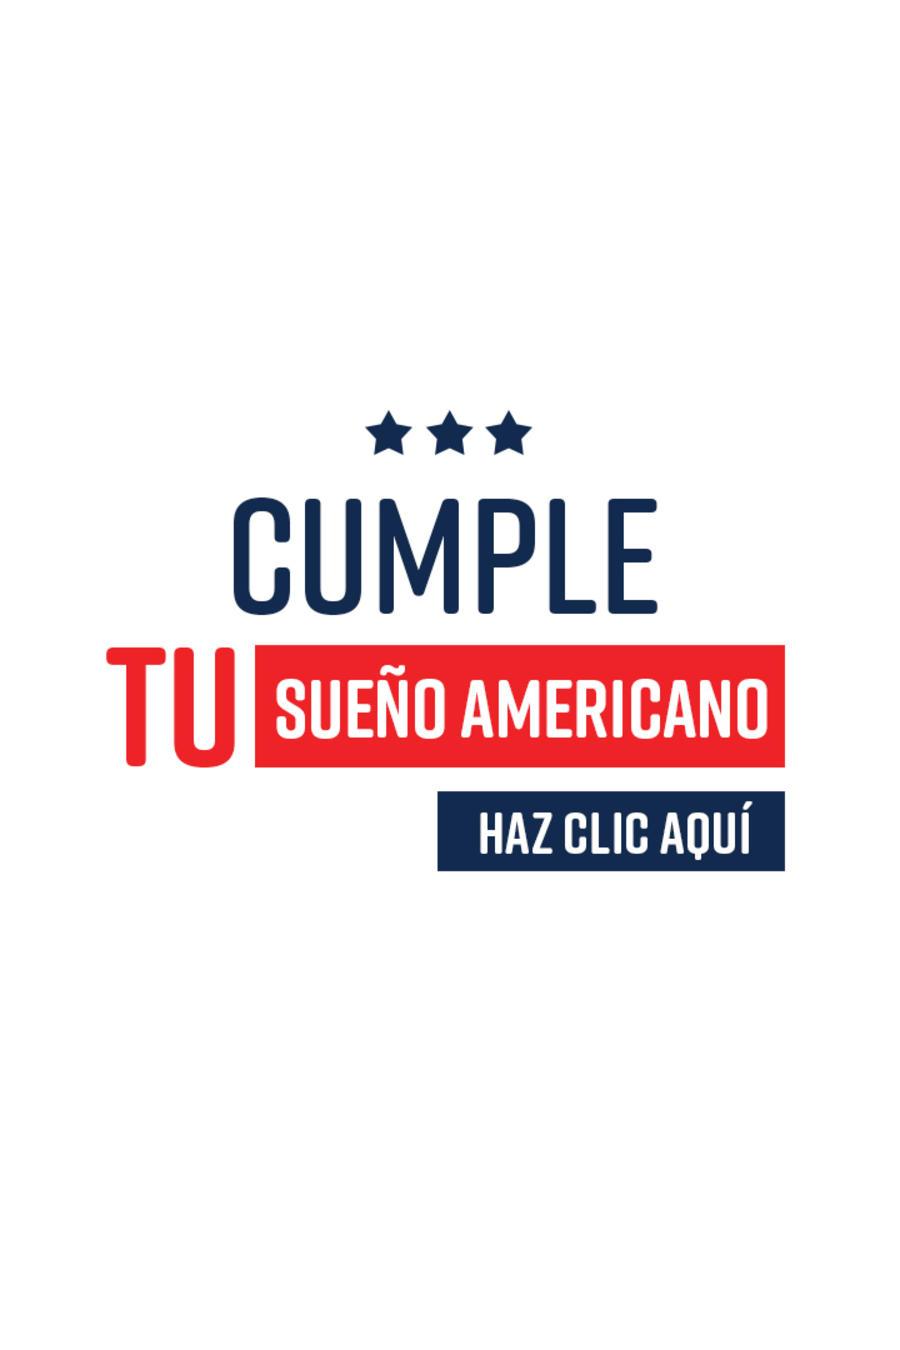 Cumple tu sueño americano